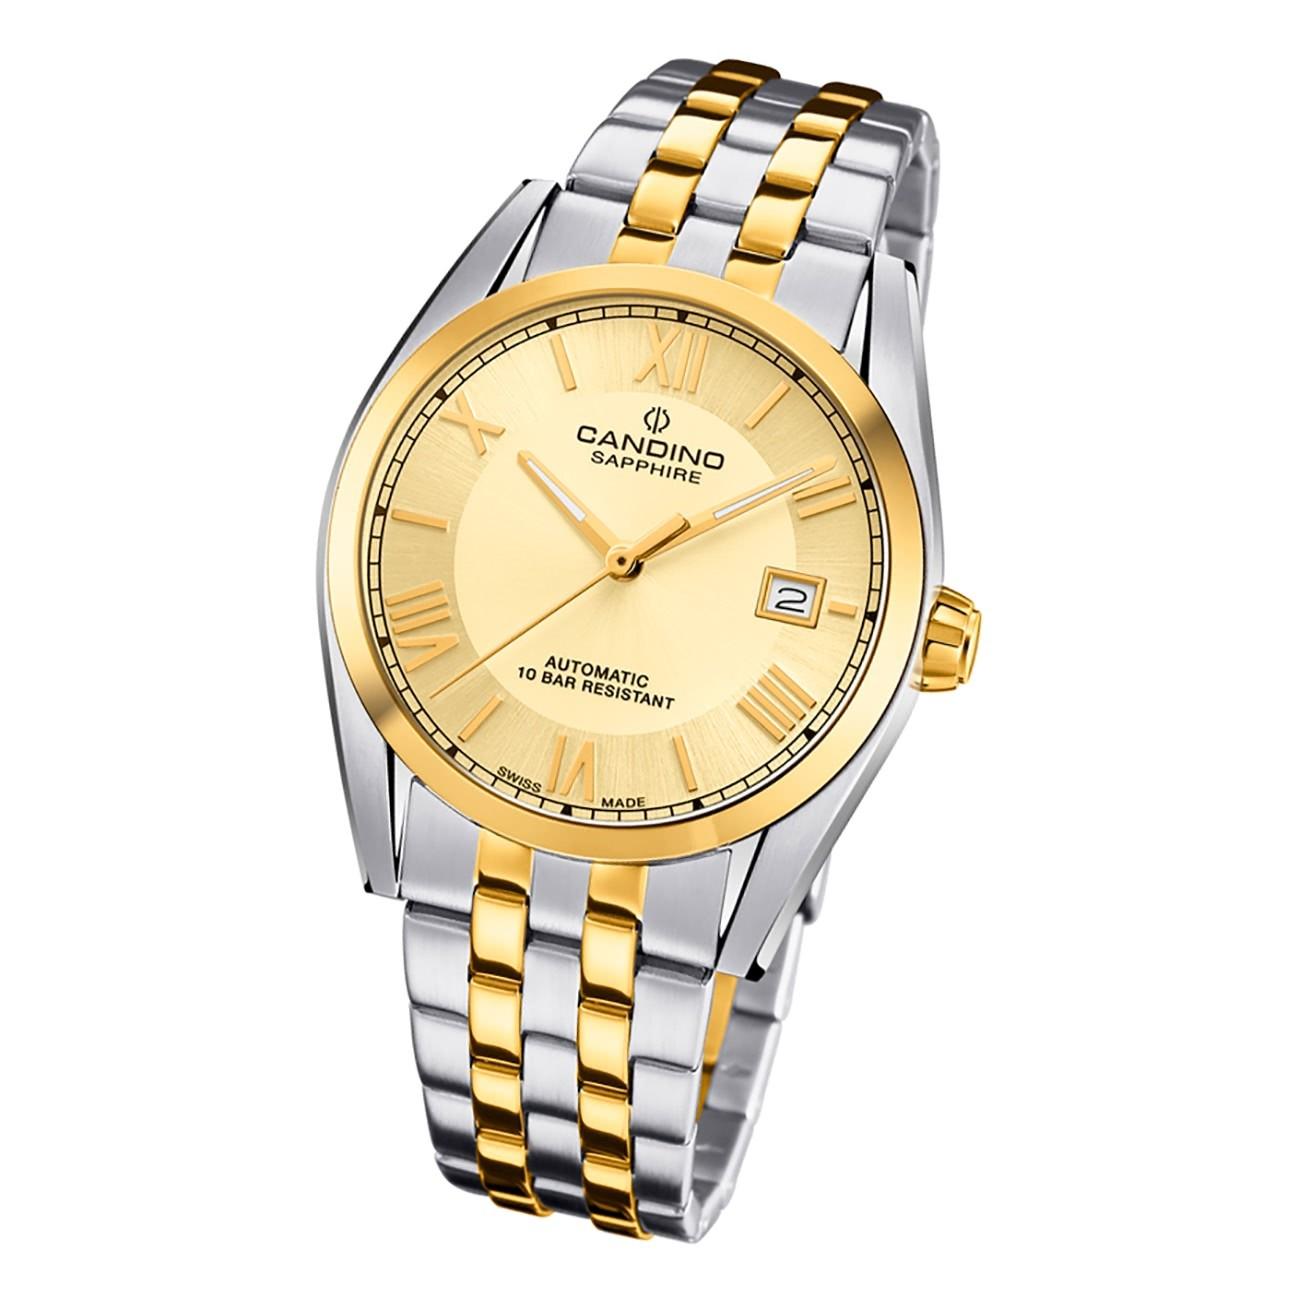 Candino Herren Armbanduhr Automatik C4702/3 Edelstahl silber gold UC4702/3